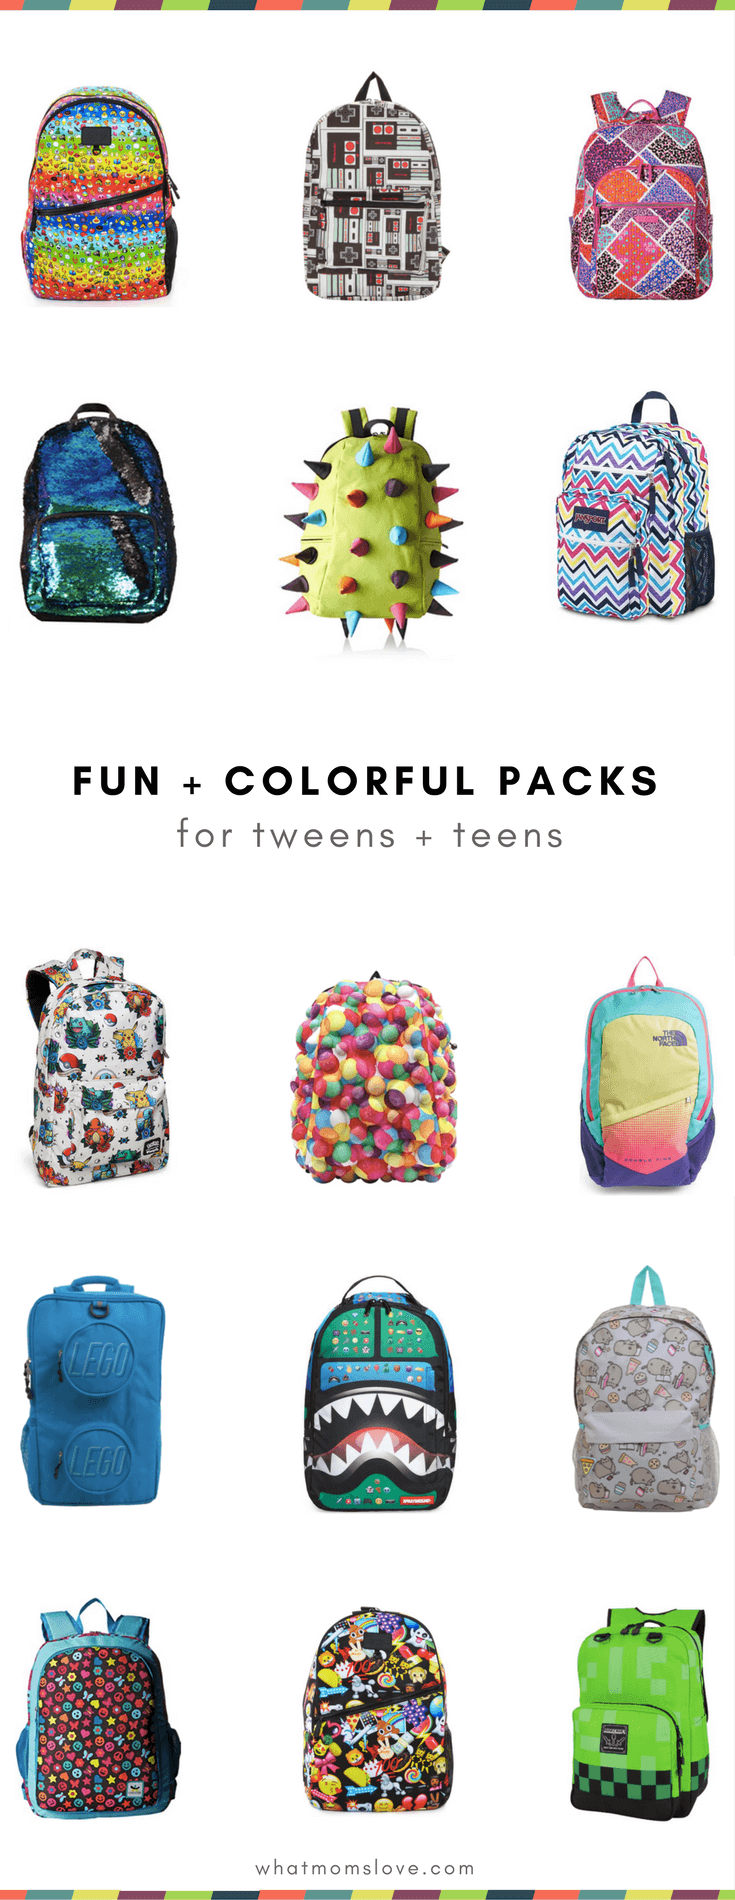 Best Backpacks for Tweens and Teens for Back to School - Colorful Fun Emoji